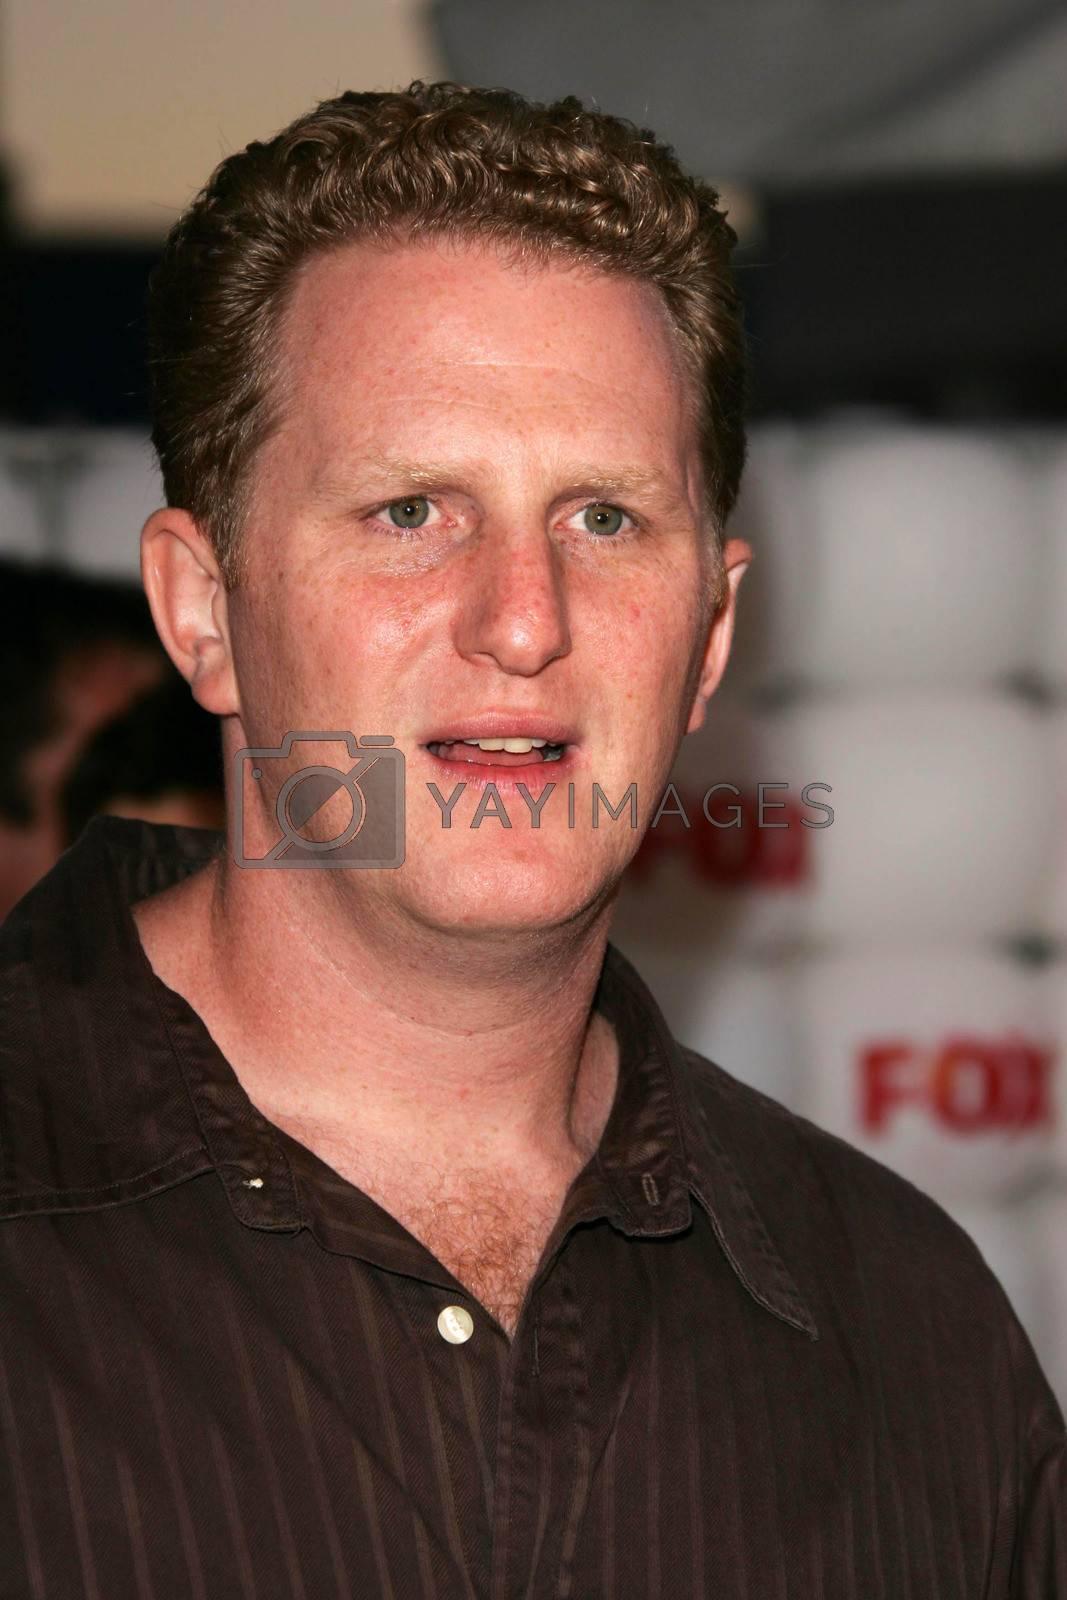 Michael Rapaport At the FOX Summer 2005 TCA Party, Santa Monica Pier, Santa Monica, CA 07-29-05